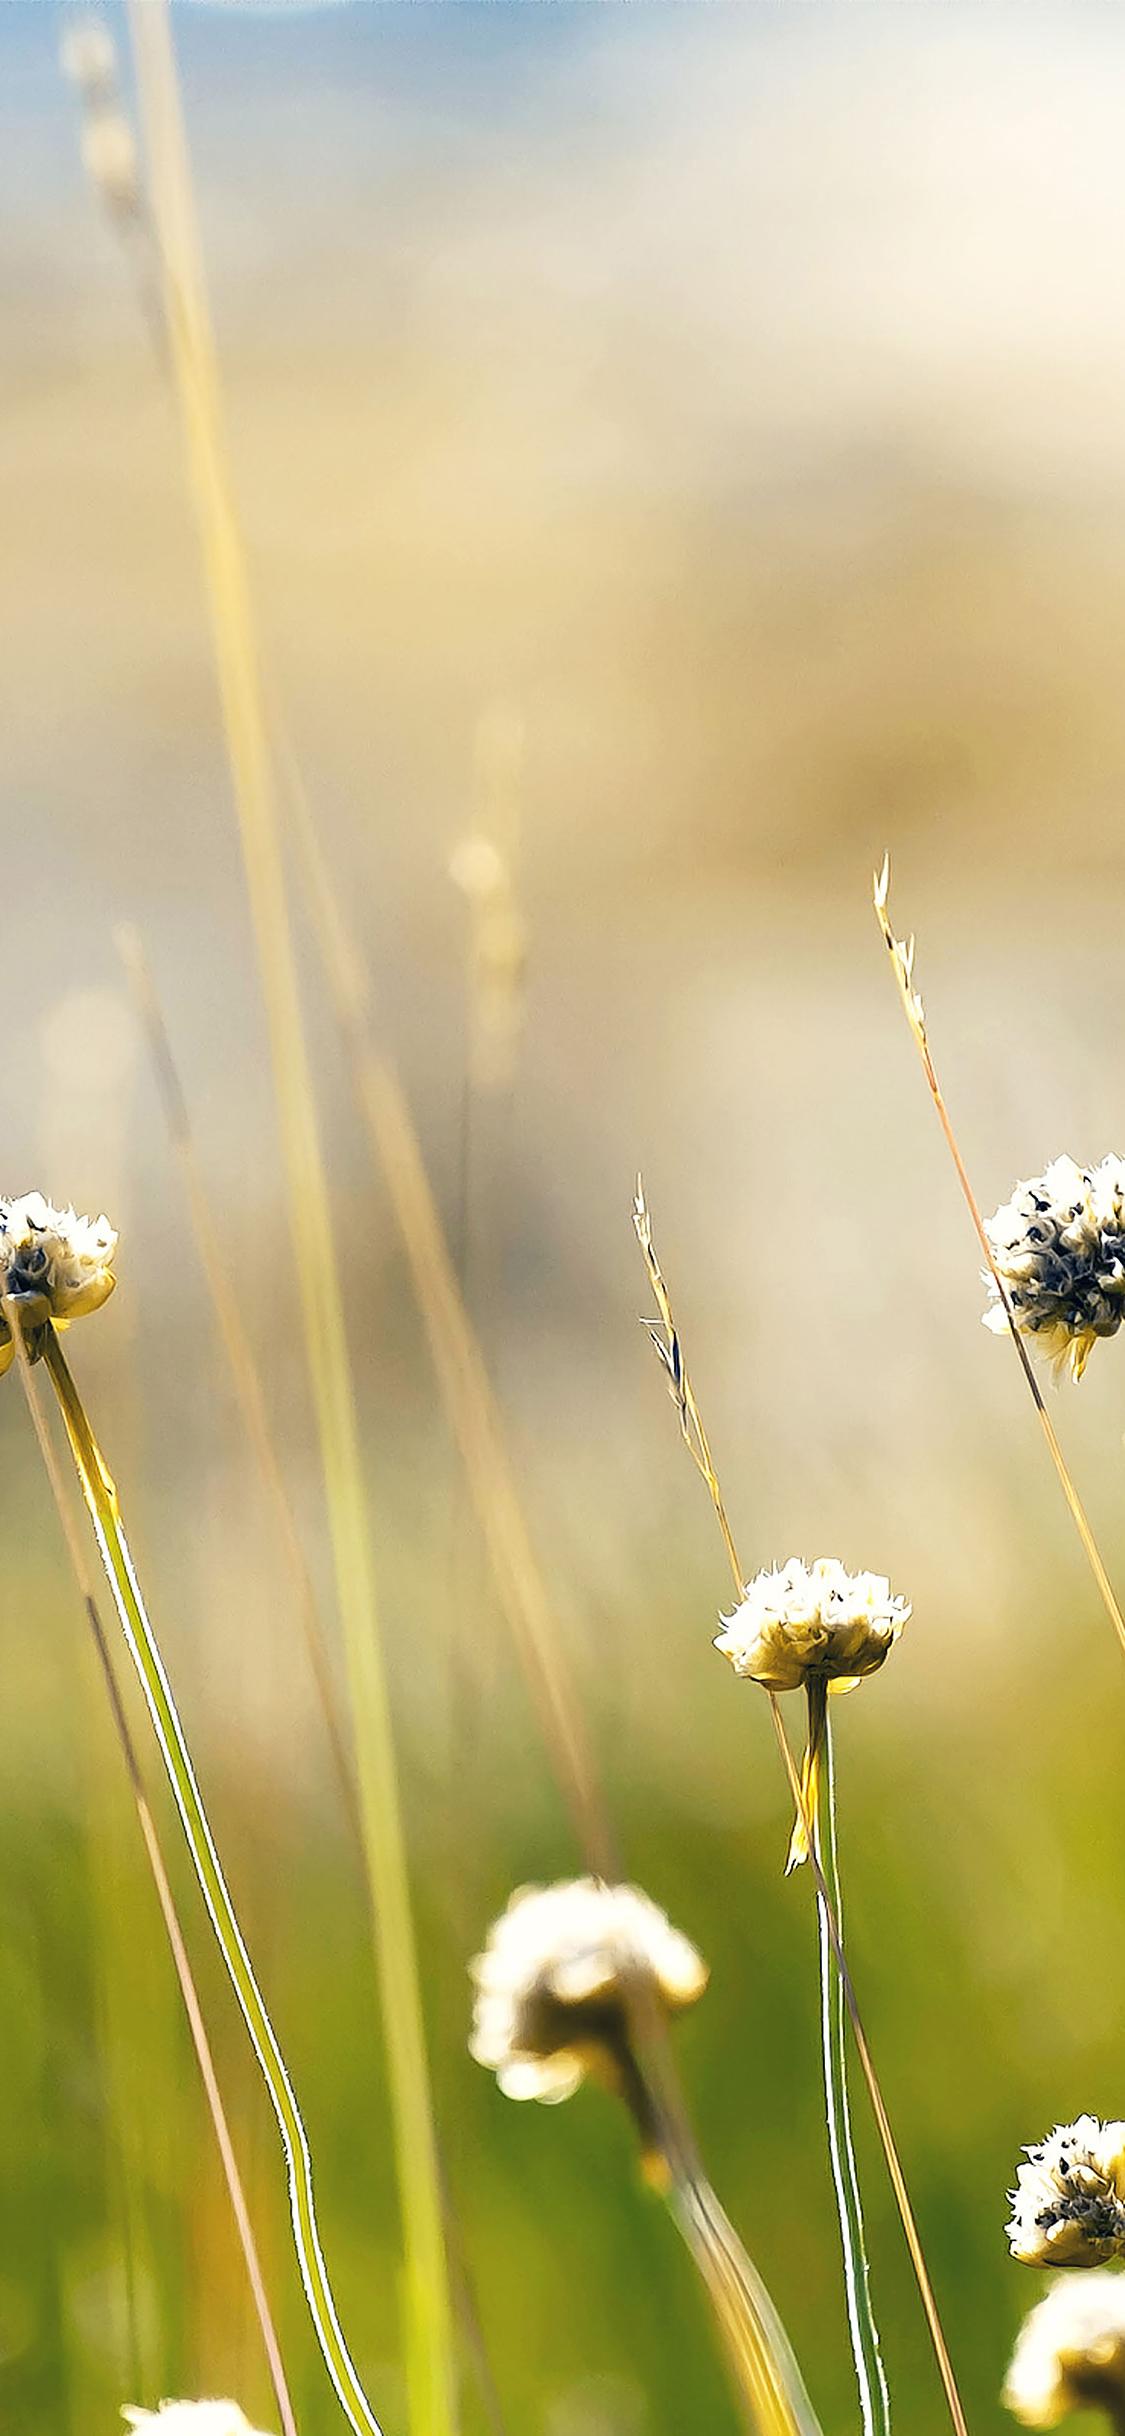 iPhoneXpapers.com-Apple-iPhone-wallpaper-mc93-wallpaper-flower-dandelion-green-nature